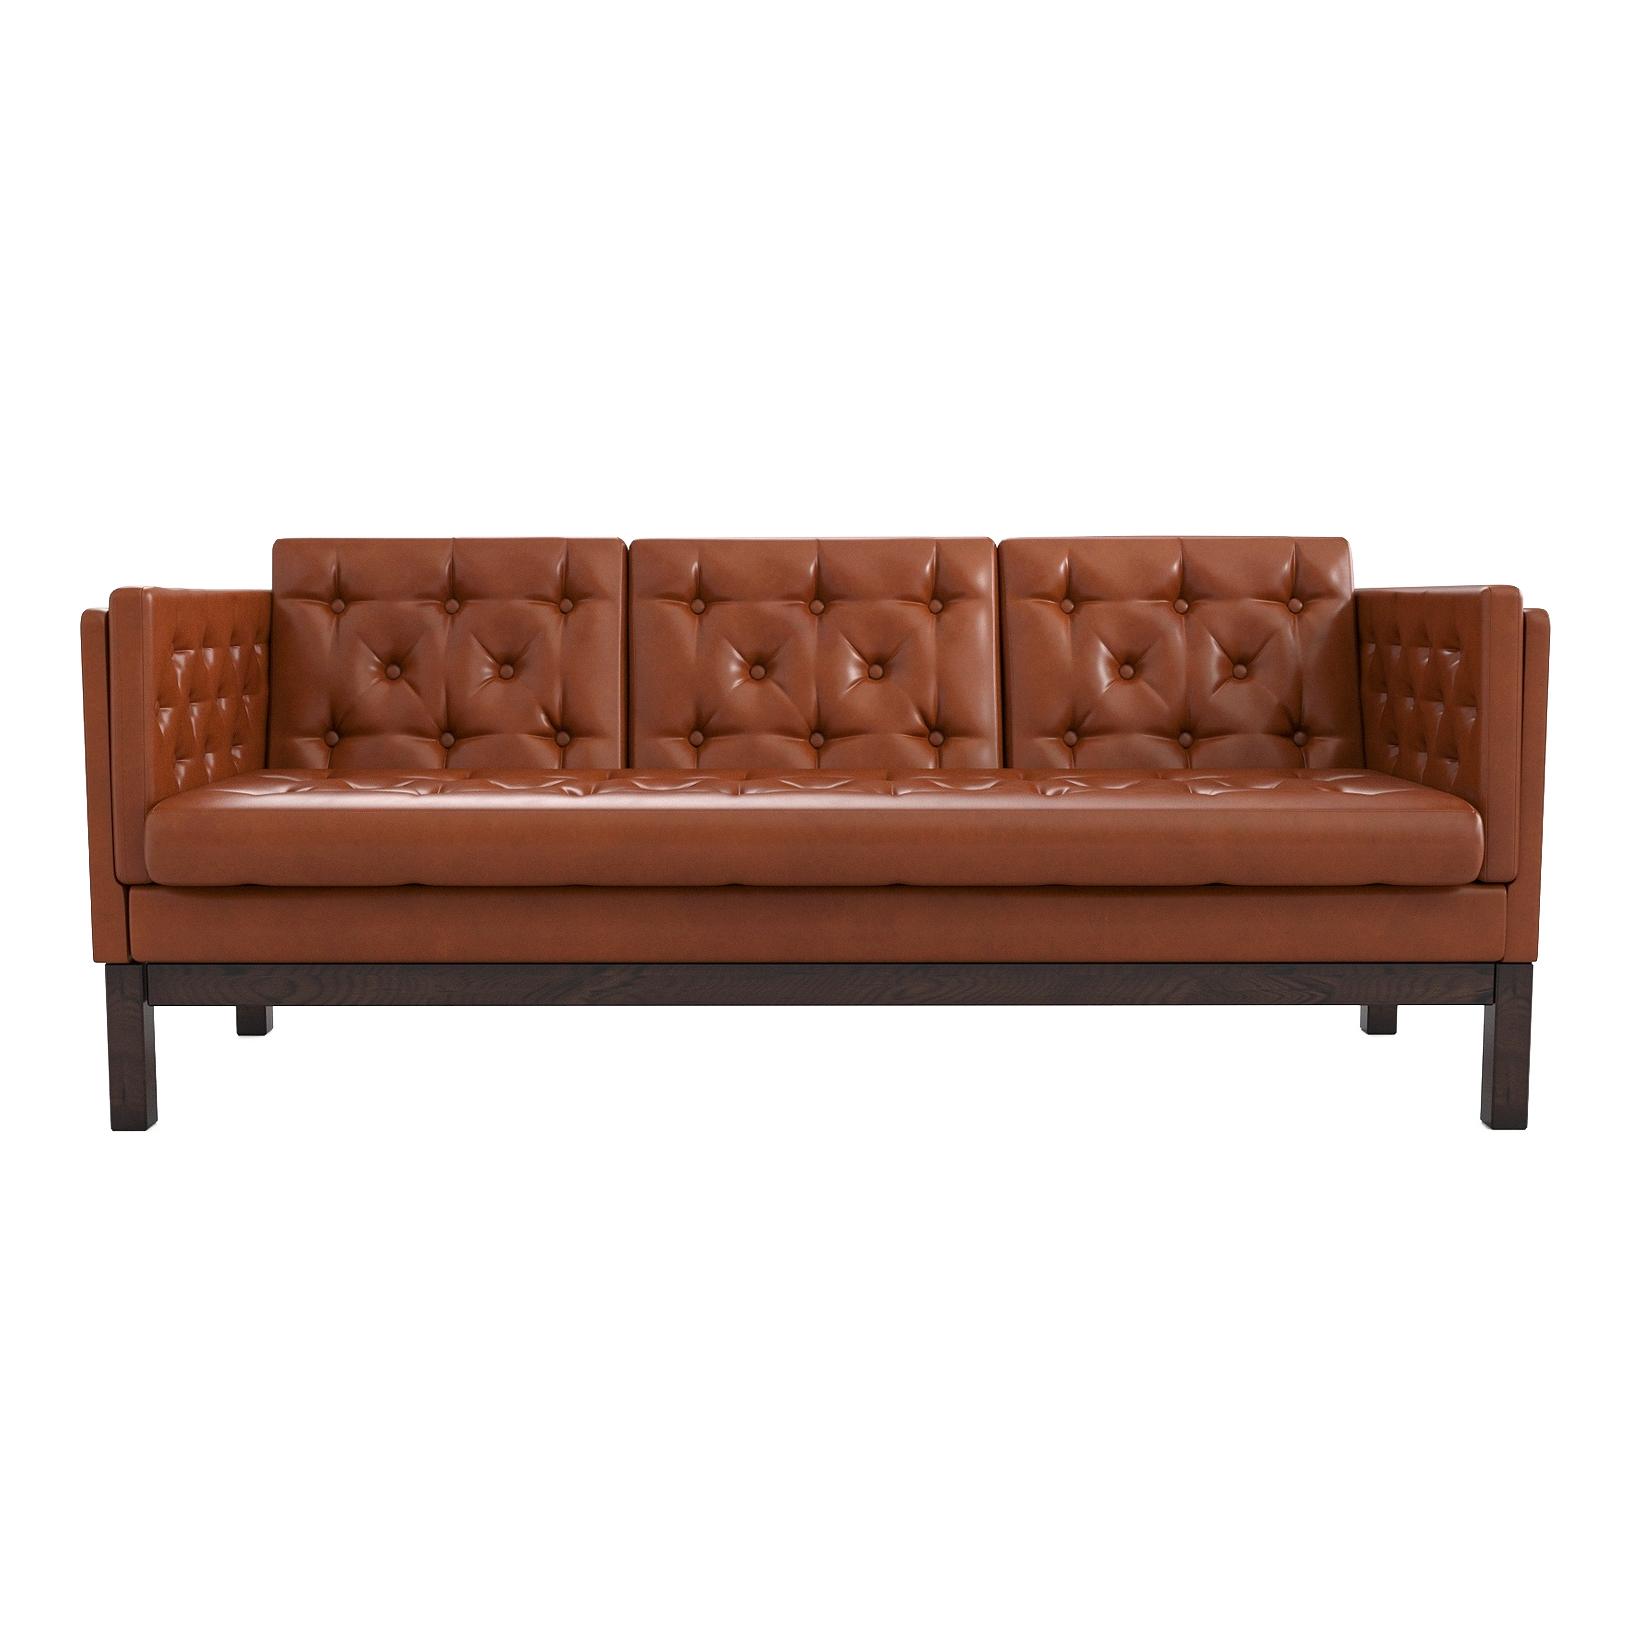 Фото - Диван AS Алана б 193x82x83 венге/оранжевый диван as алана б 193x82x83 венге чоколейт